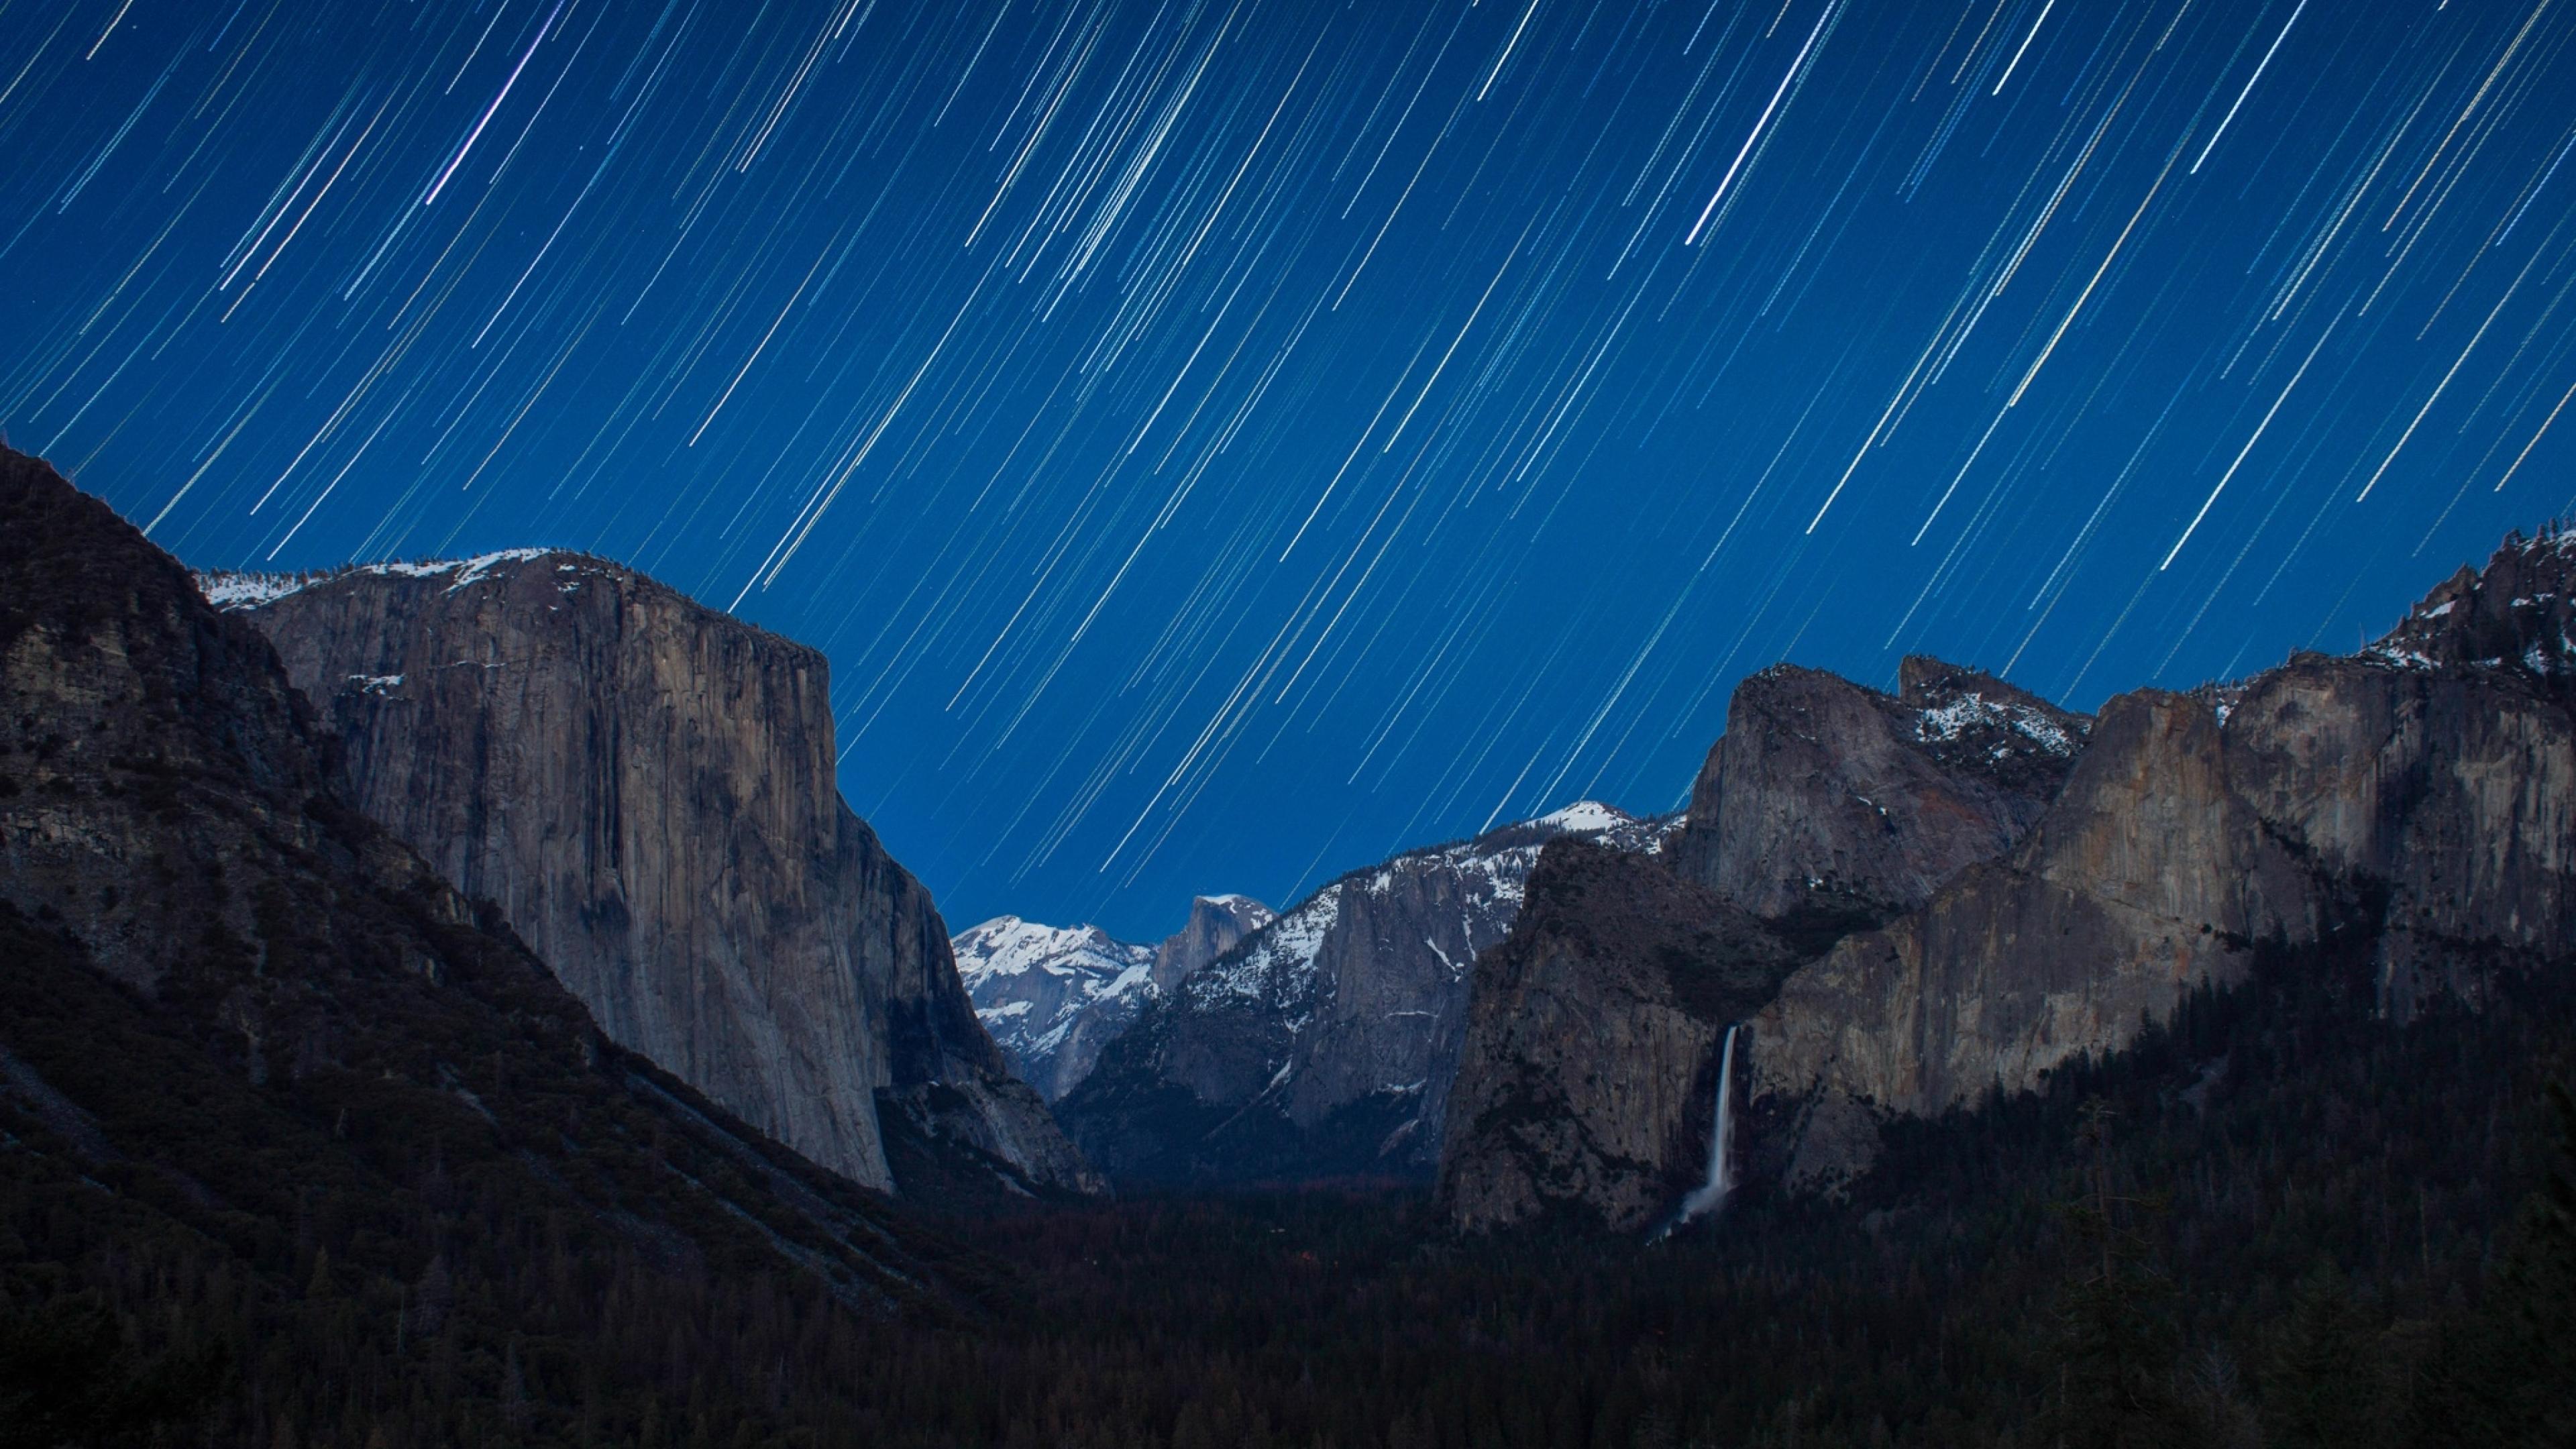 3840x2160 Yosemite National Park Star Trail 4k Wallpaper Hd